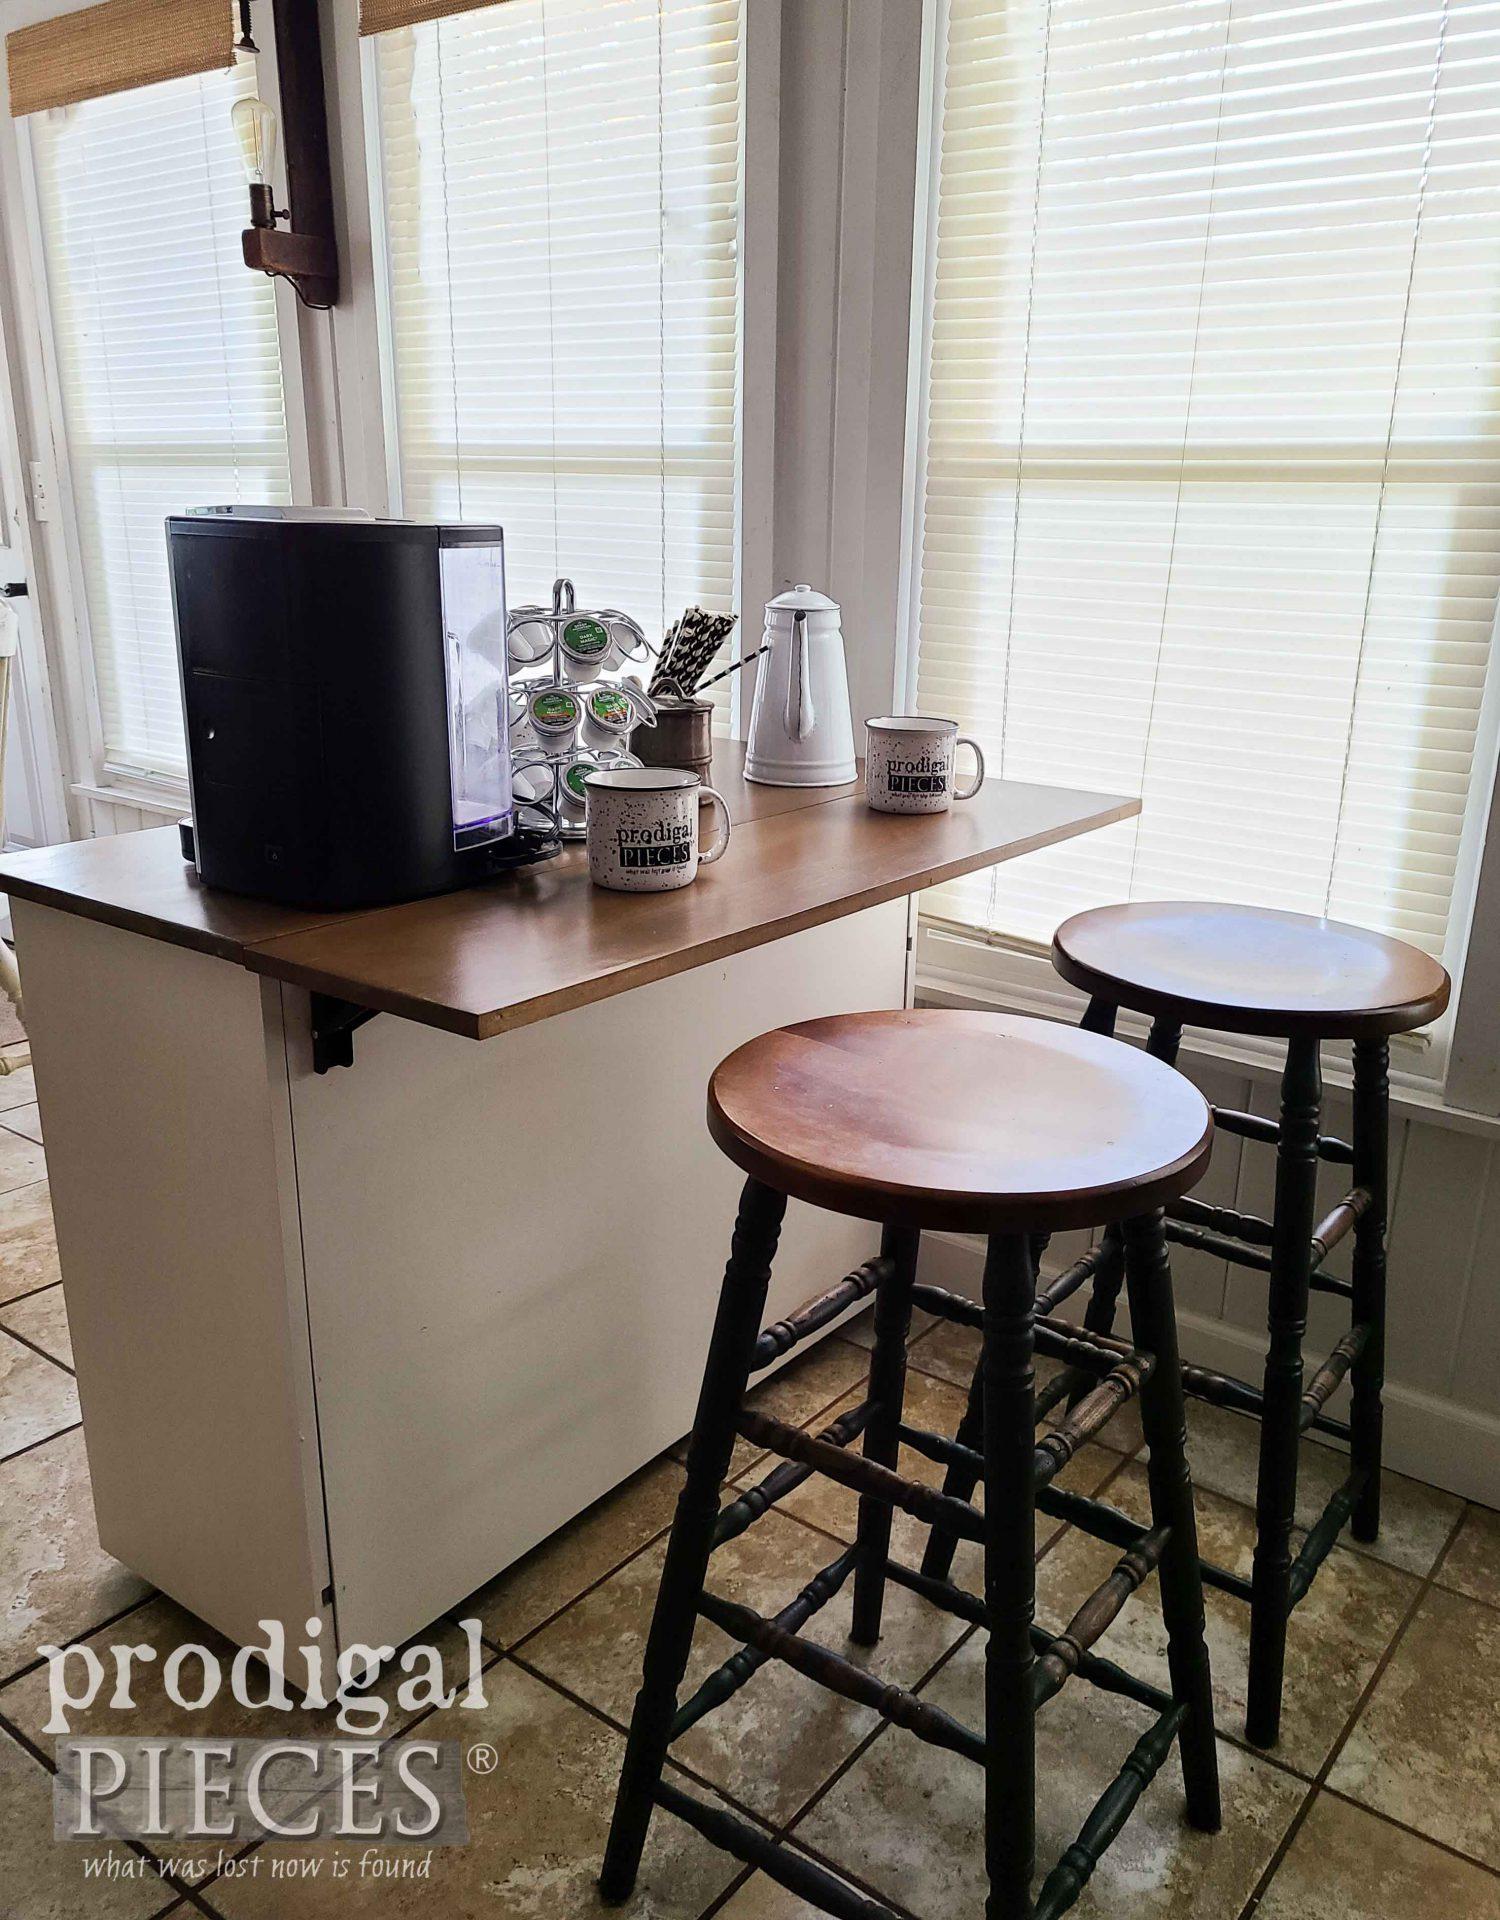 DIY Coffee Bar with Stool Setup by Larissa of Prodigal Pieces | prodigalpieces.com #prodigalpieces #diy #home #furniture #farmhouse #homedecor